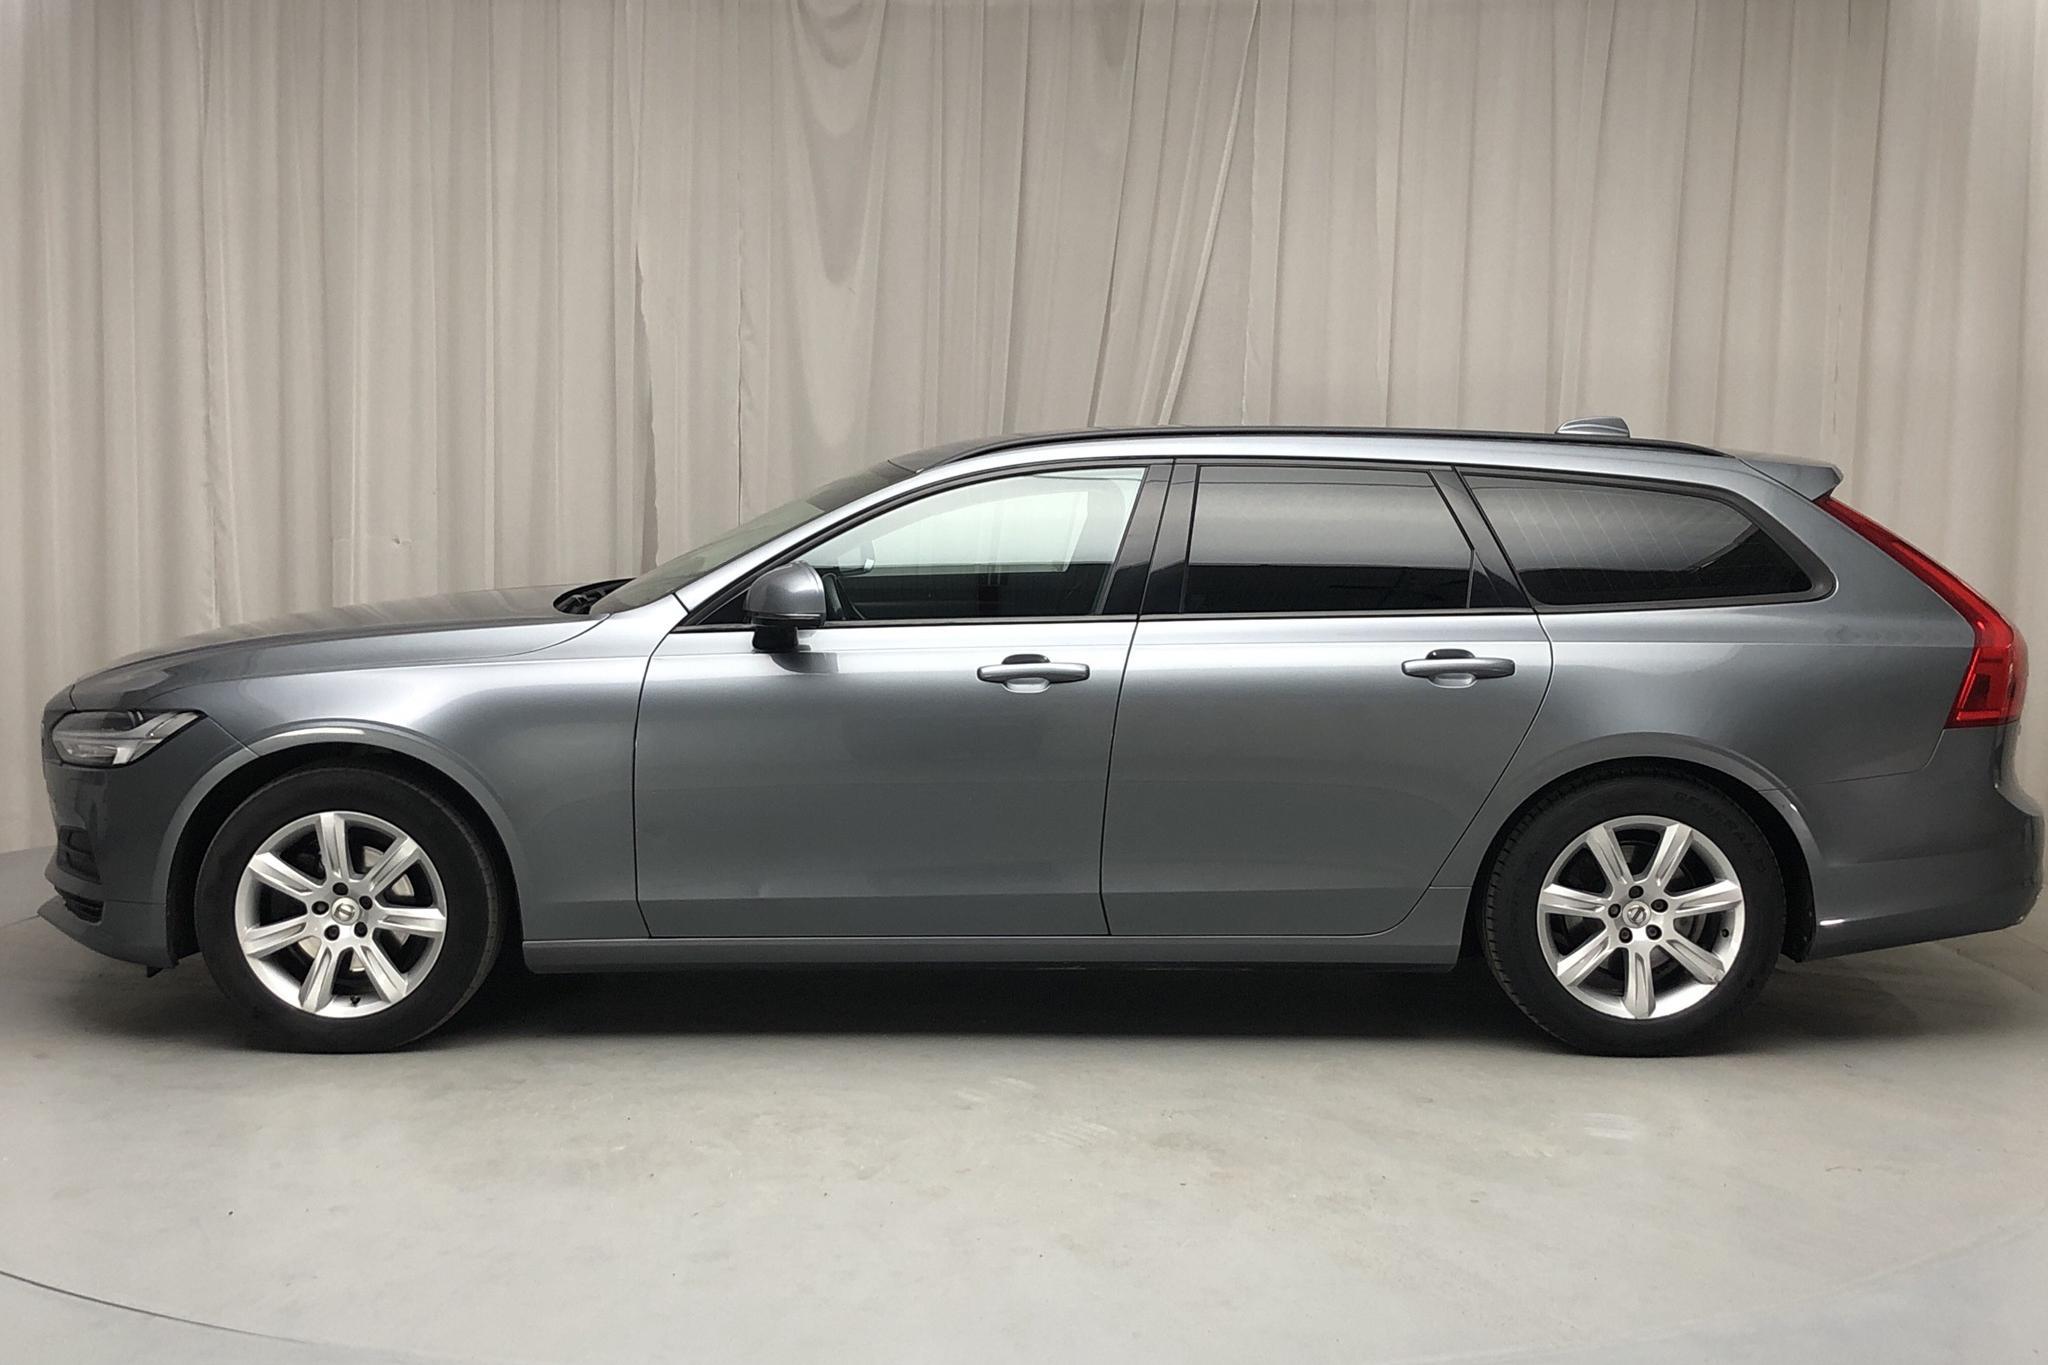 Volvo V90 D4 (190hk) - 123 000 km - Automatic - gray - 2017